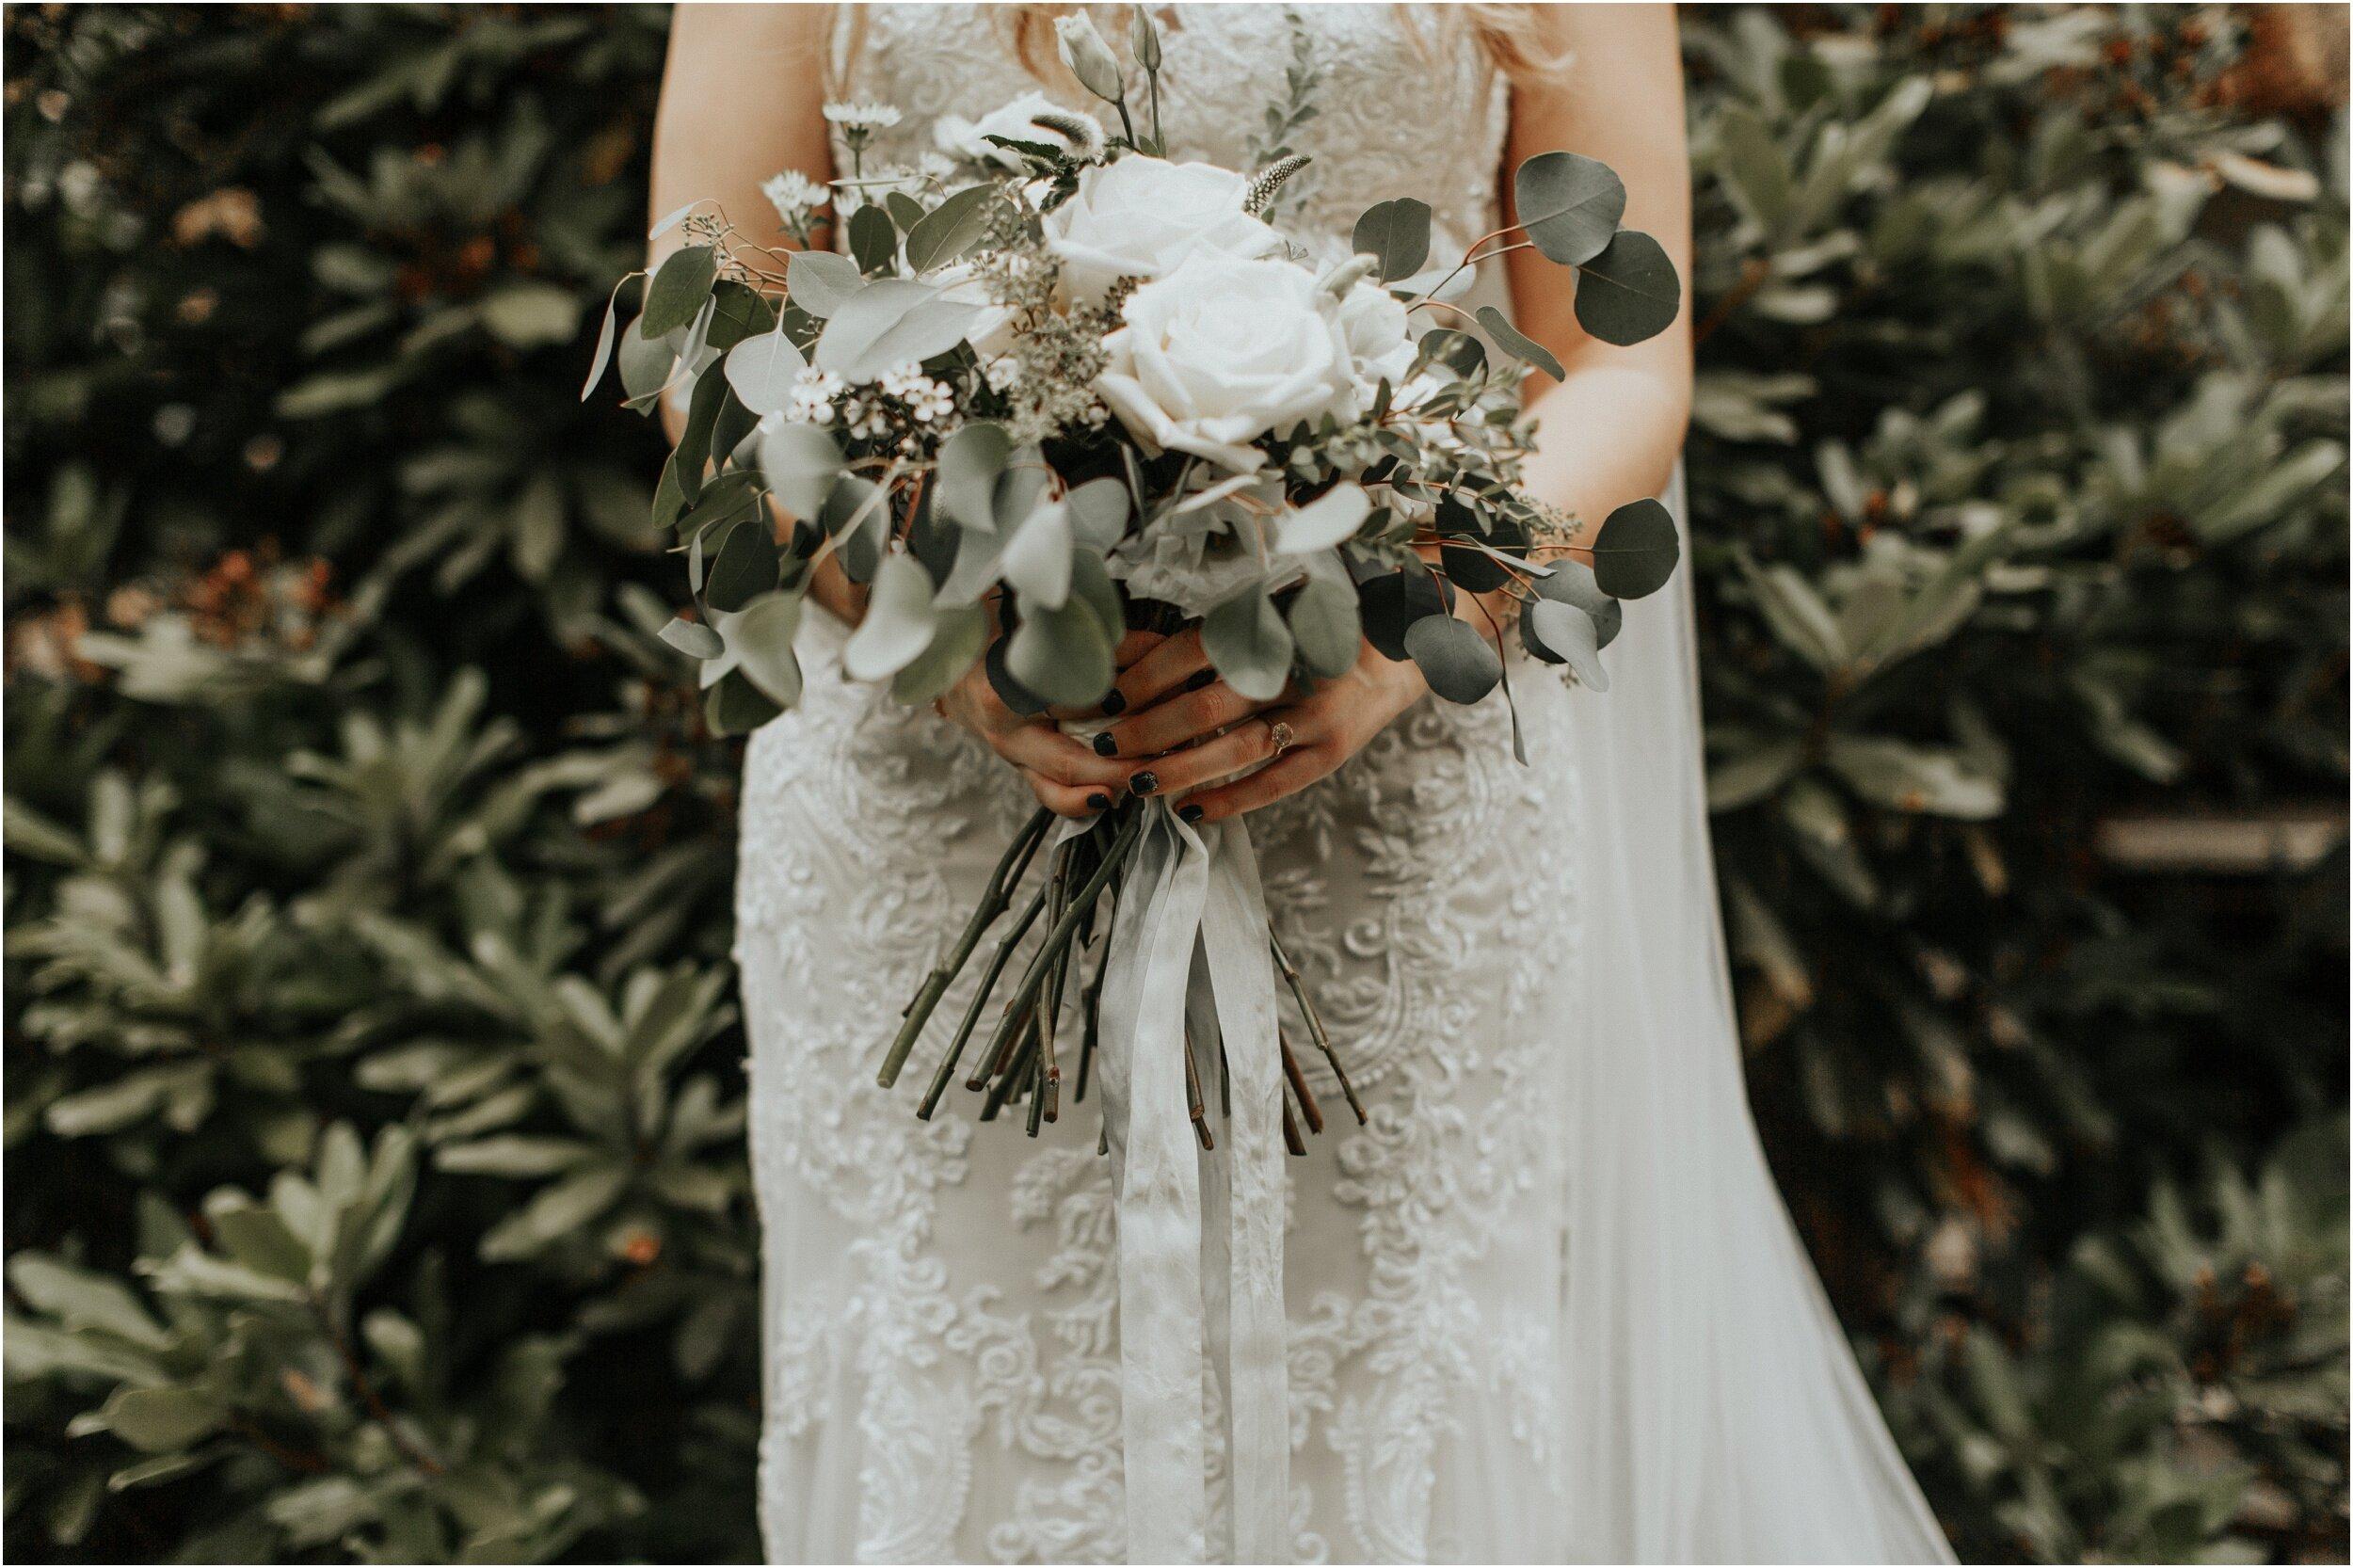 steph-and-jordan-cox-our-wedding-historic-shady-lane-compass-wedding-collective-hazel-lining-photography-destination-elopement-wedding-engagement-photography_0022.jpg